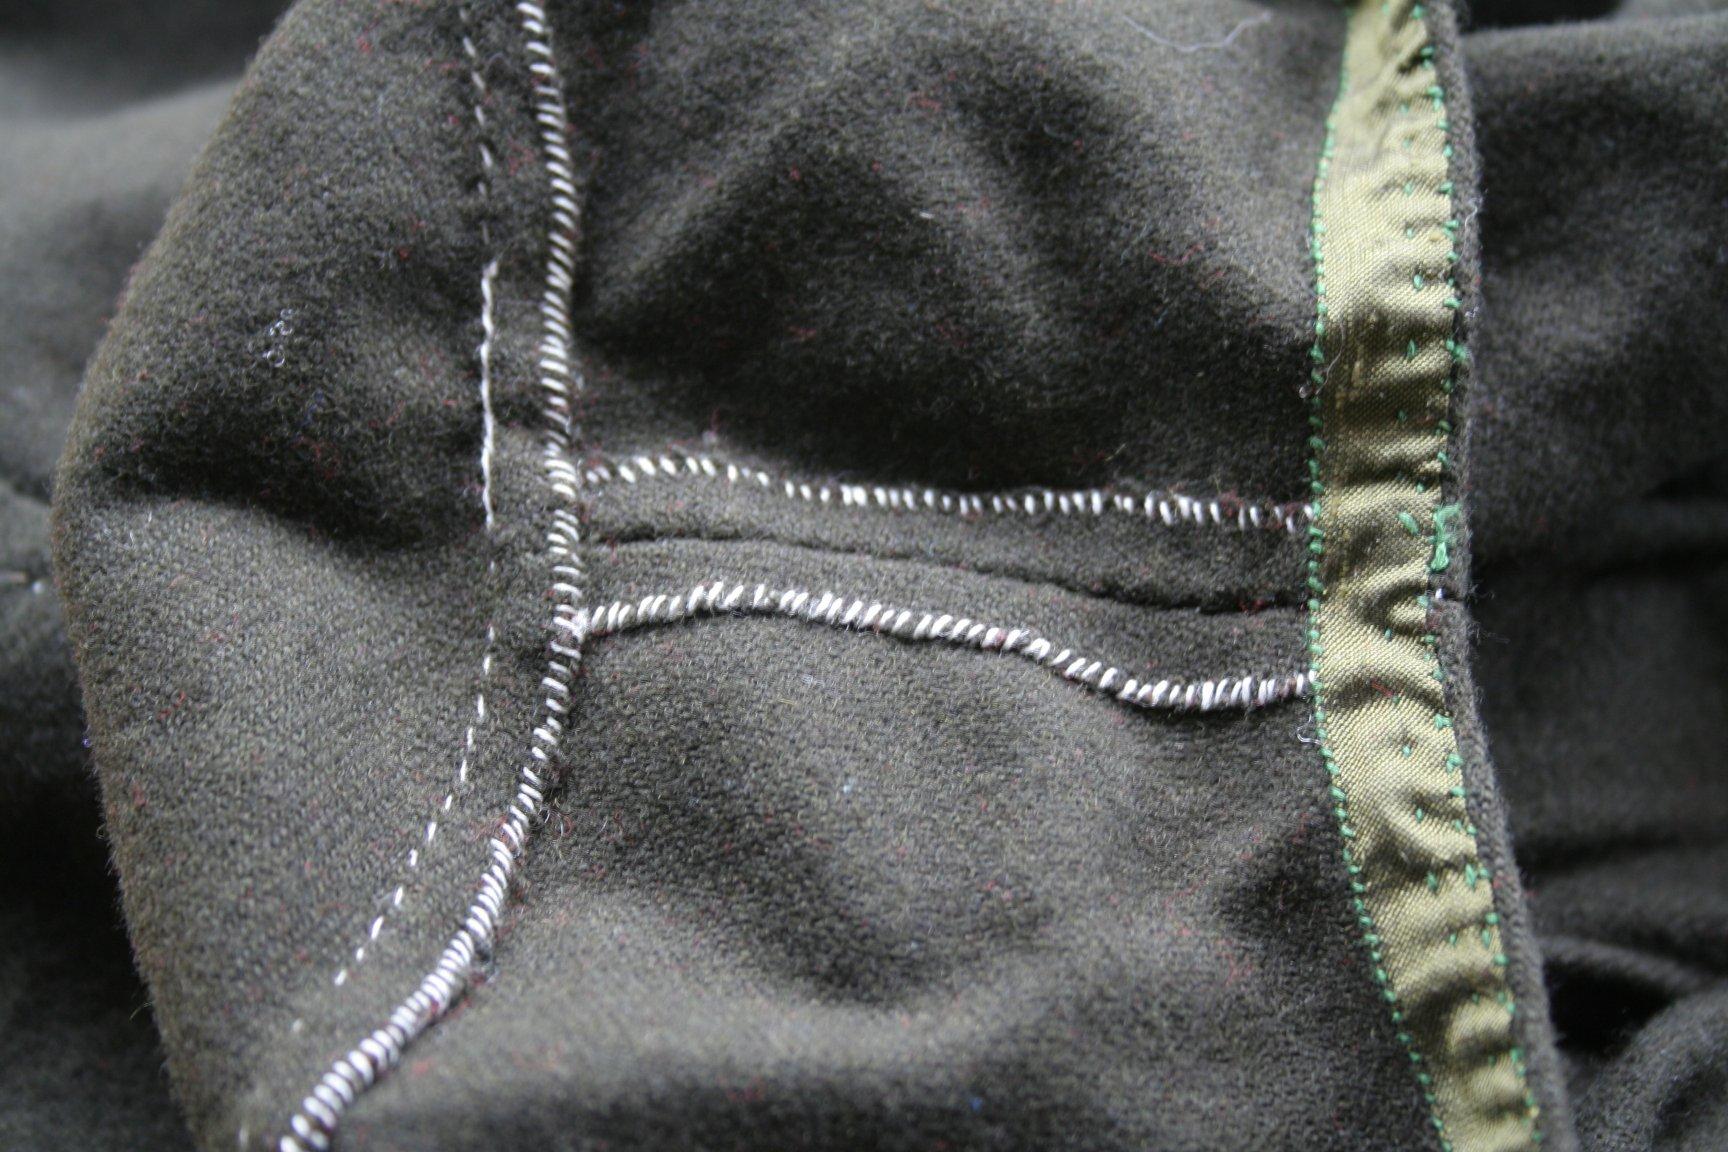 Handsewn tunic